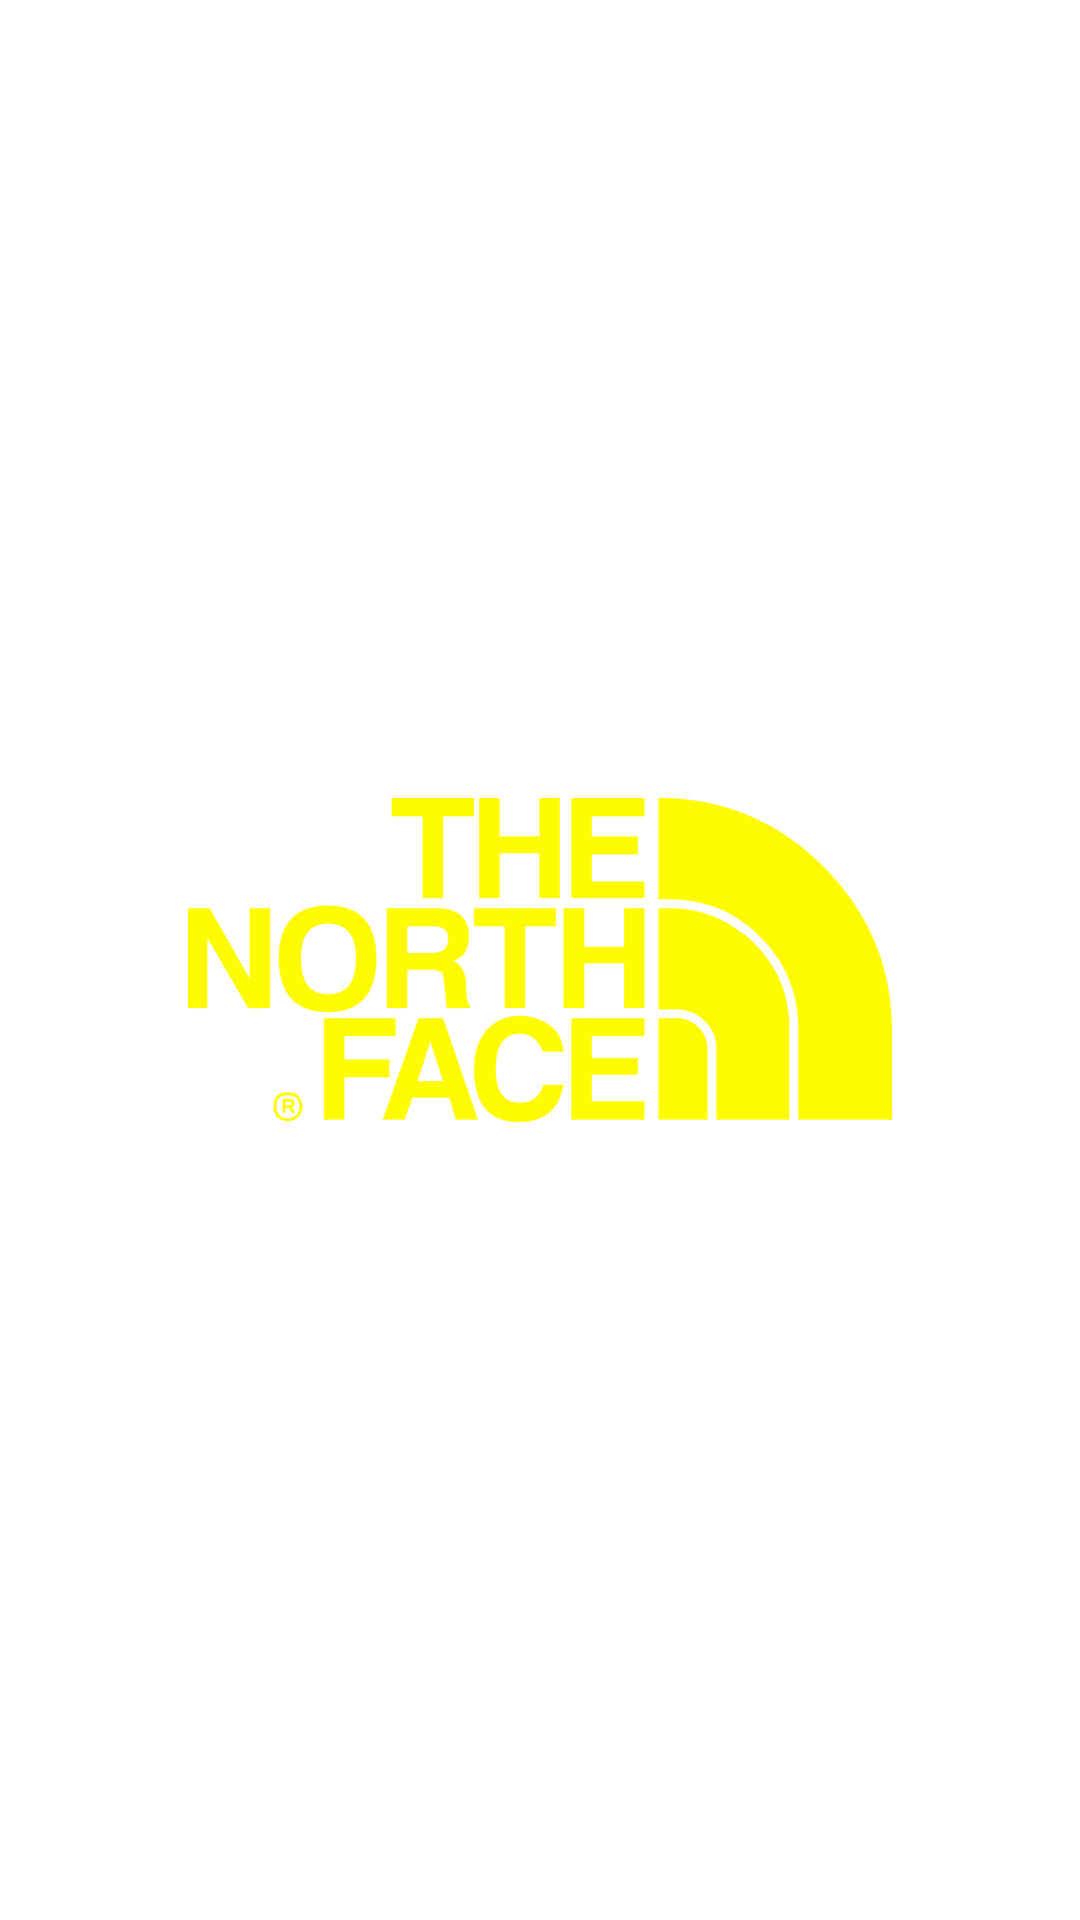 northface06